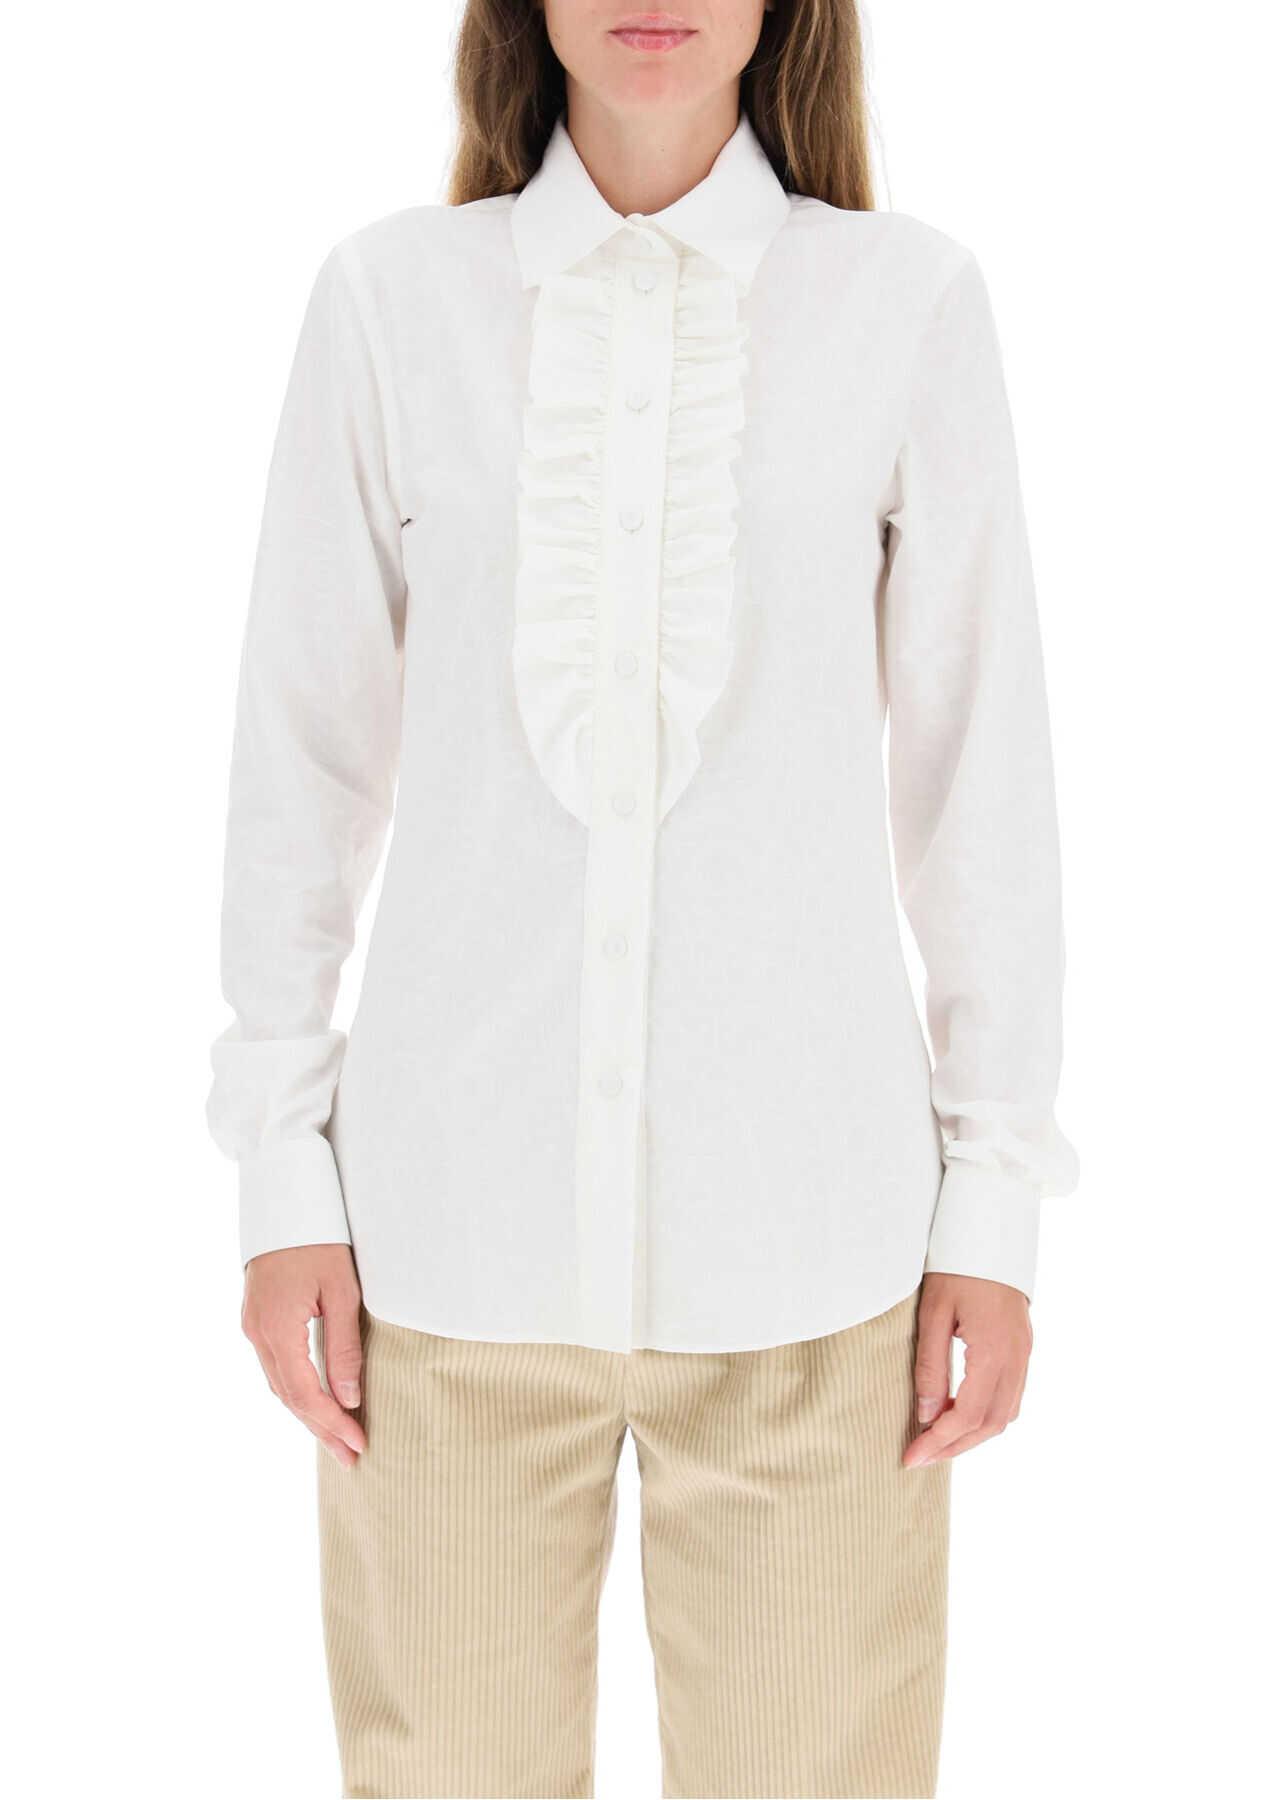 Moschino Poplin Jacquard Shirt A0214 5436 FANTASIA BIANCO image0